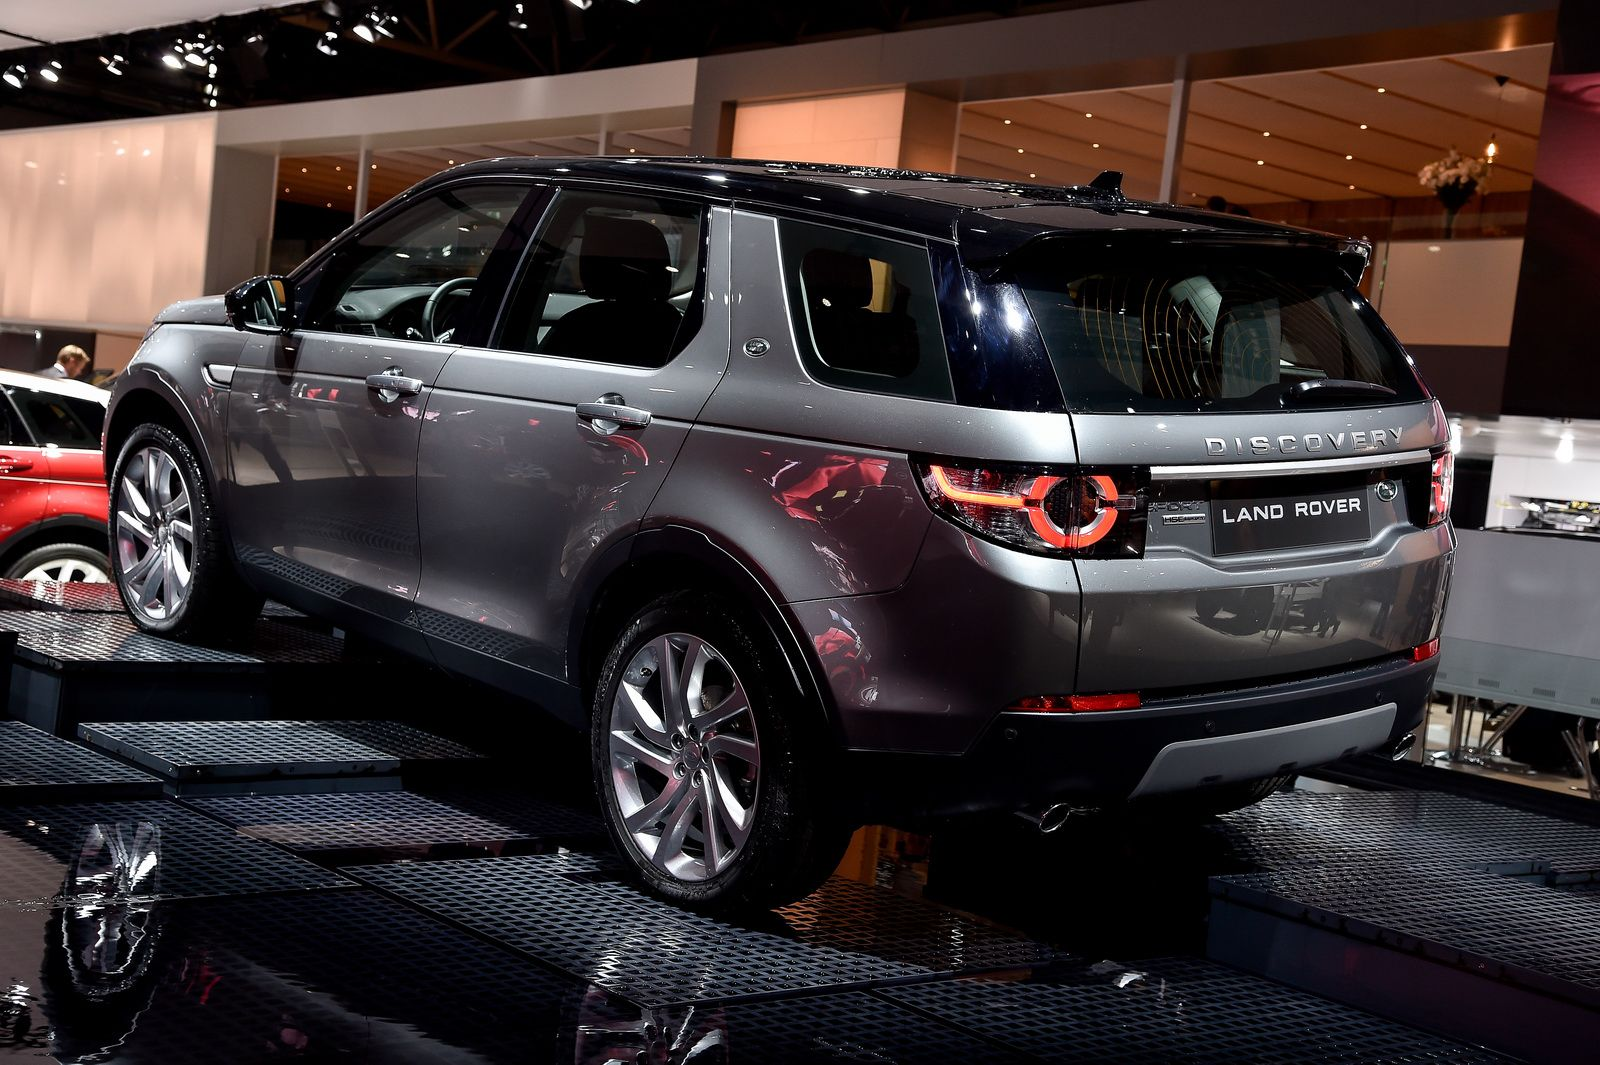 New Discovery Sport Corris Grey Santorini Black Roof Google Search Range Rover